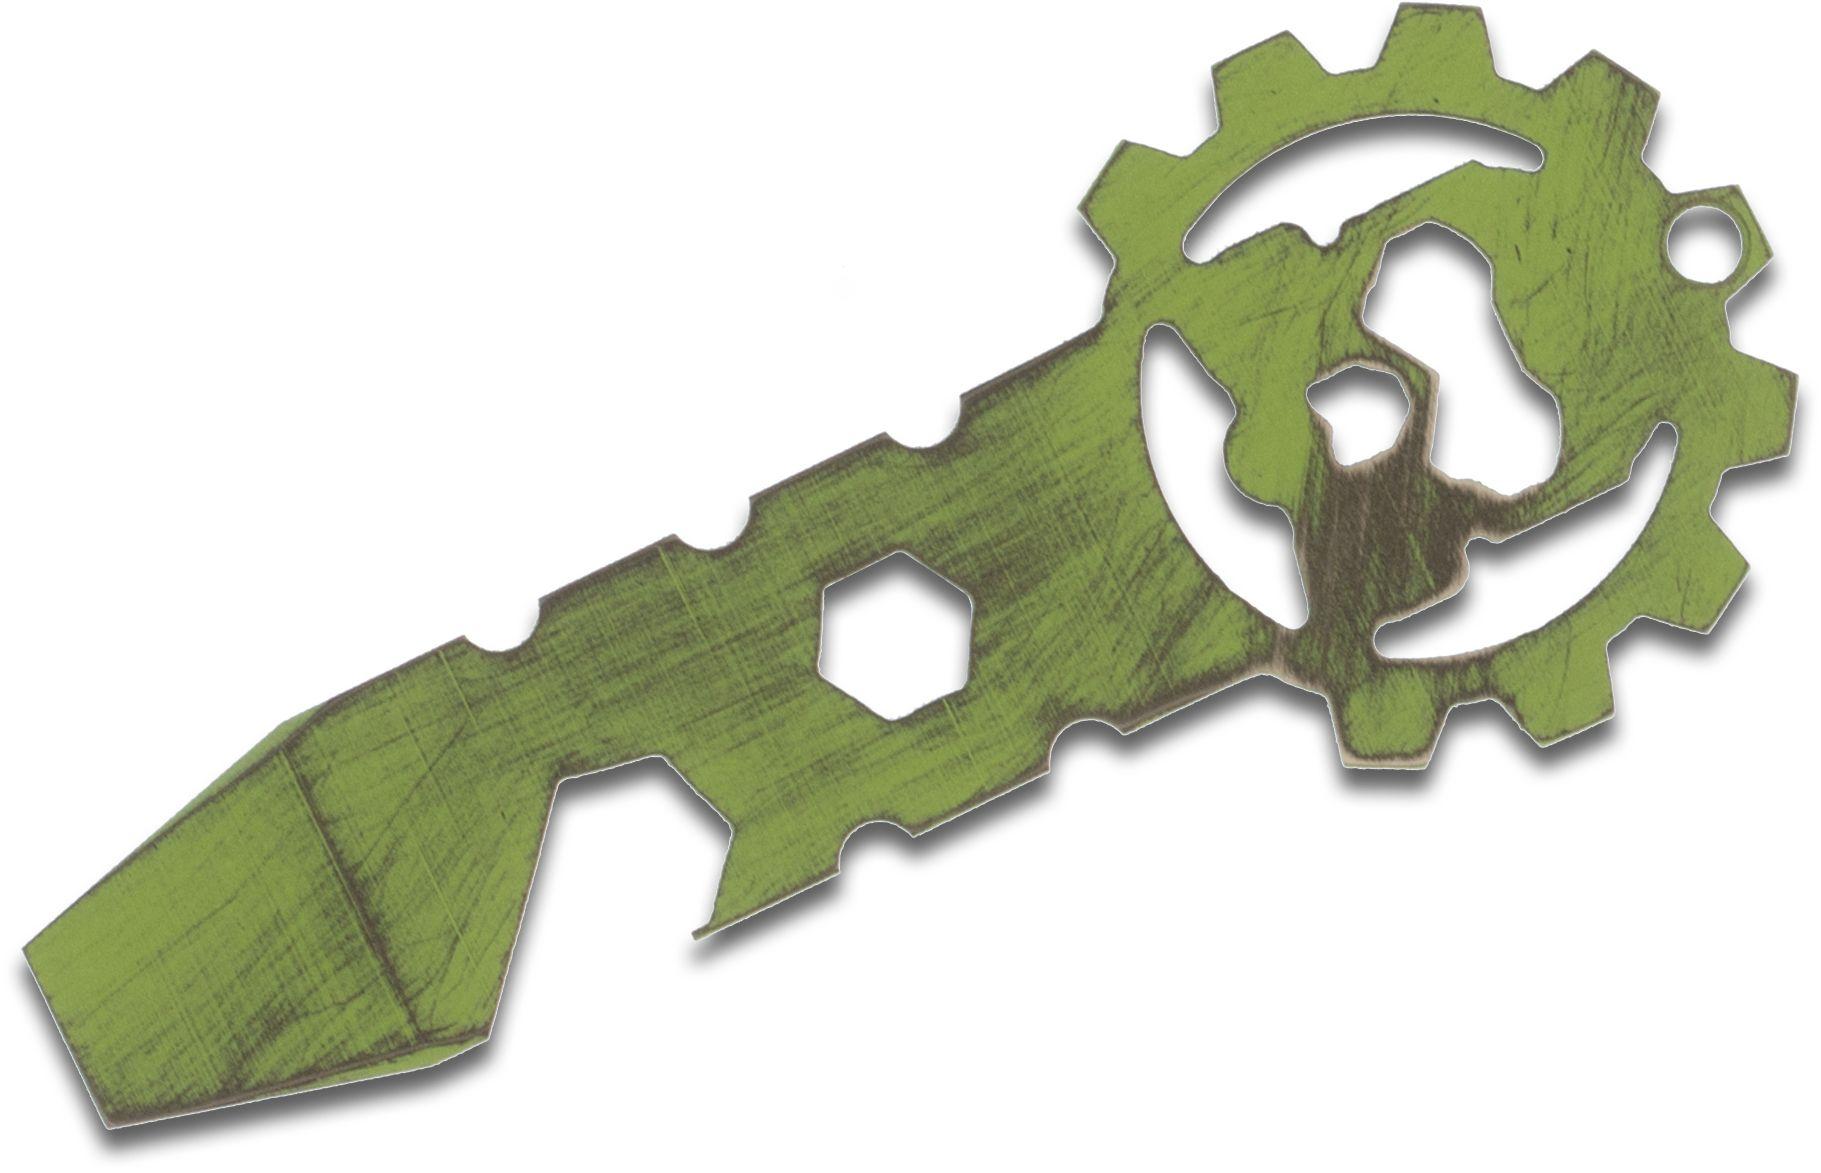 Smock Knives SmocKey Titanium Keychain Pocket Tool, Green Battleworn Cerakote, 3.25 inch Overall